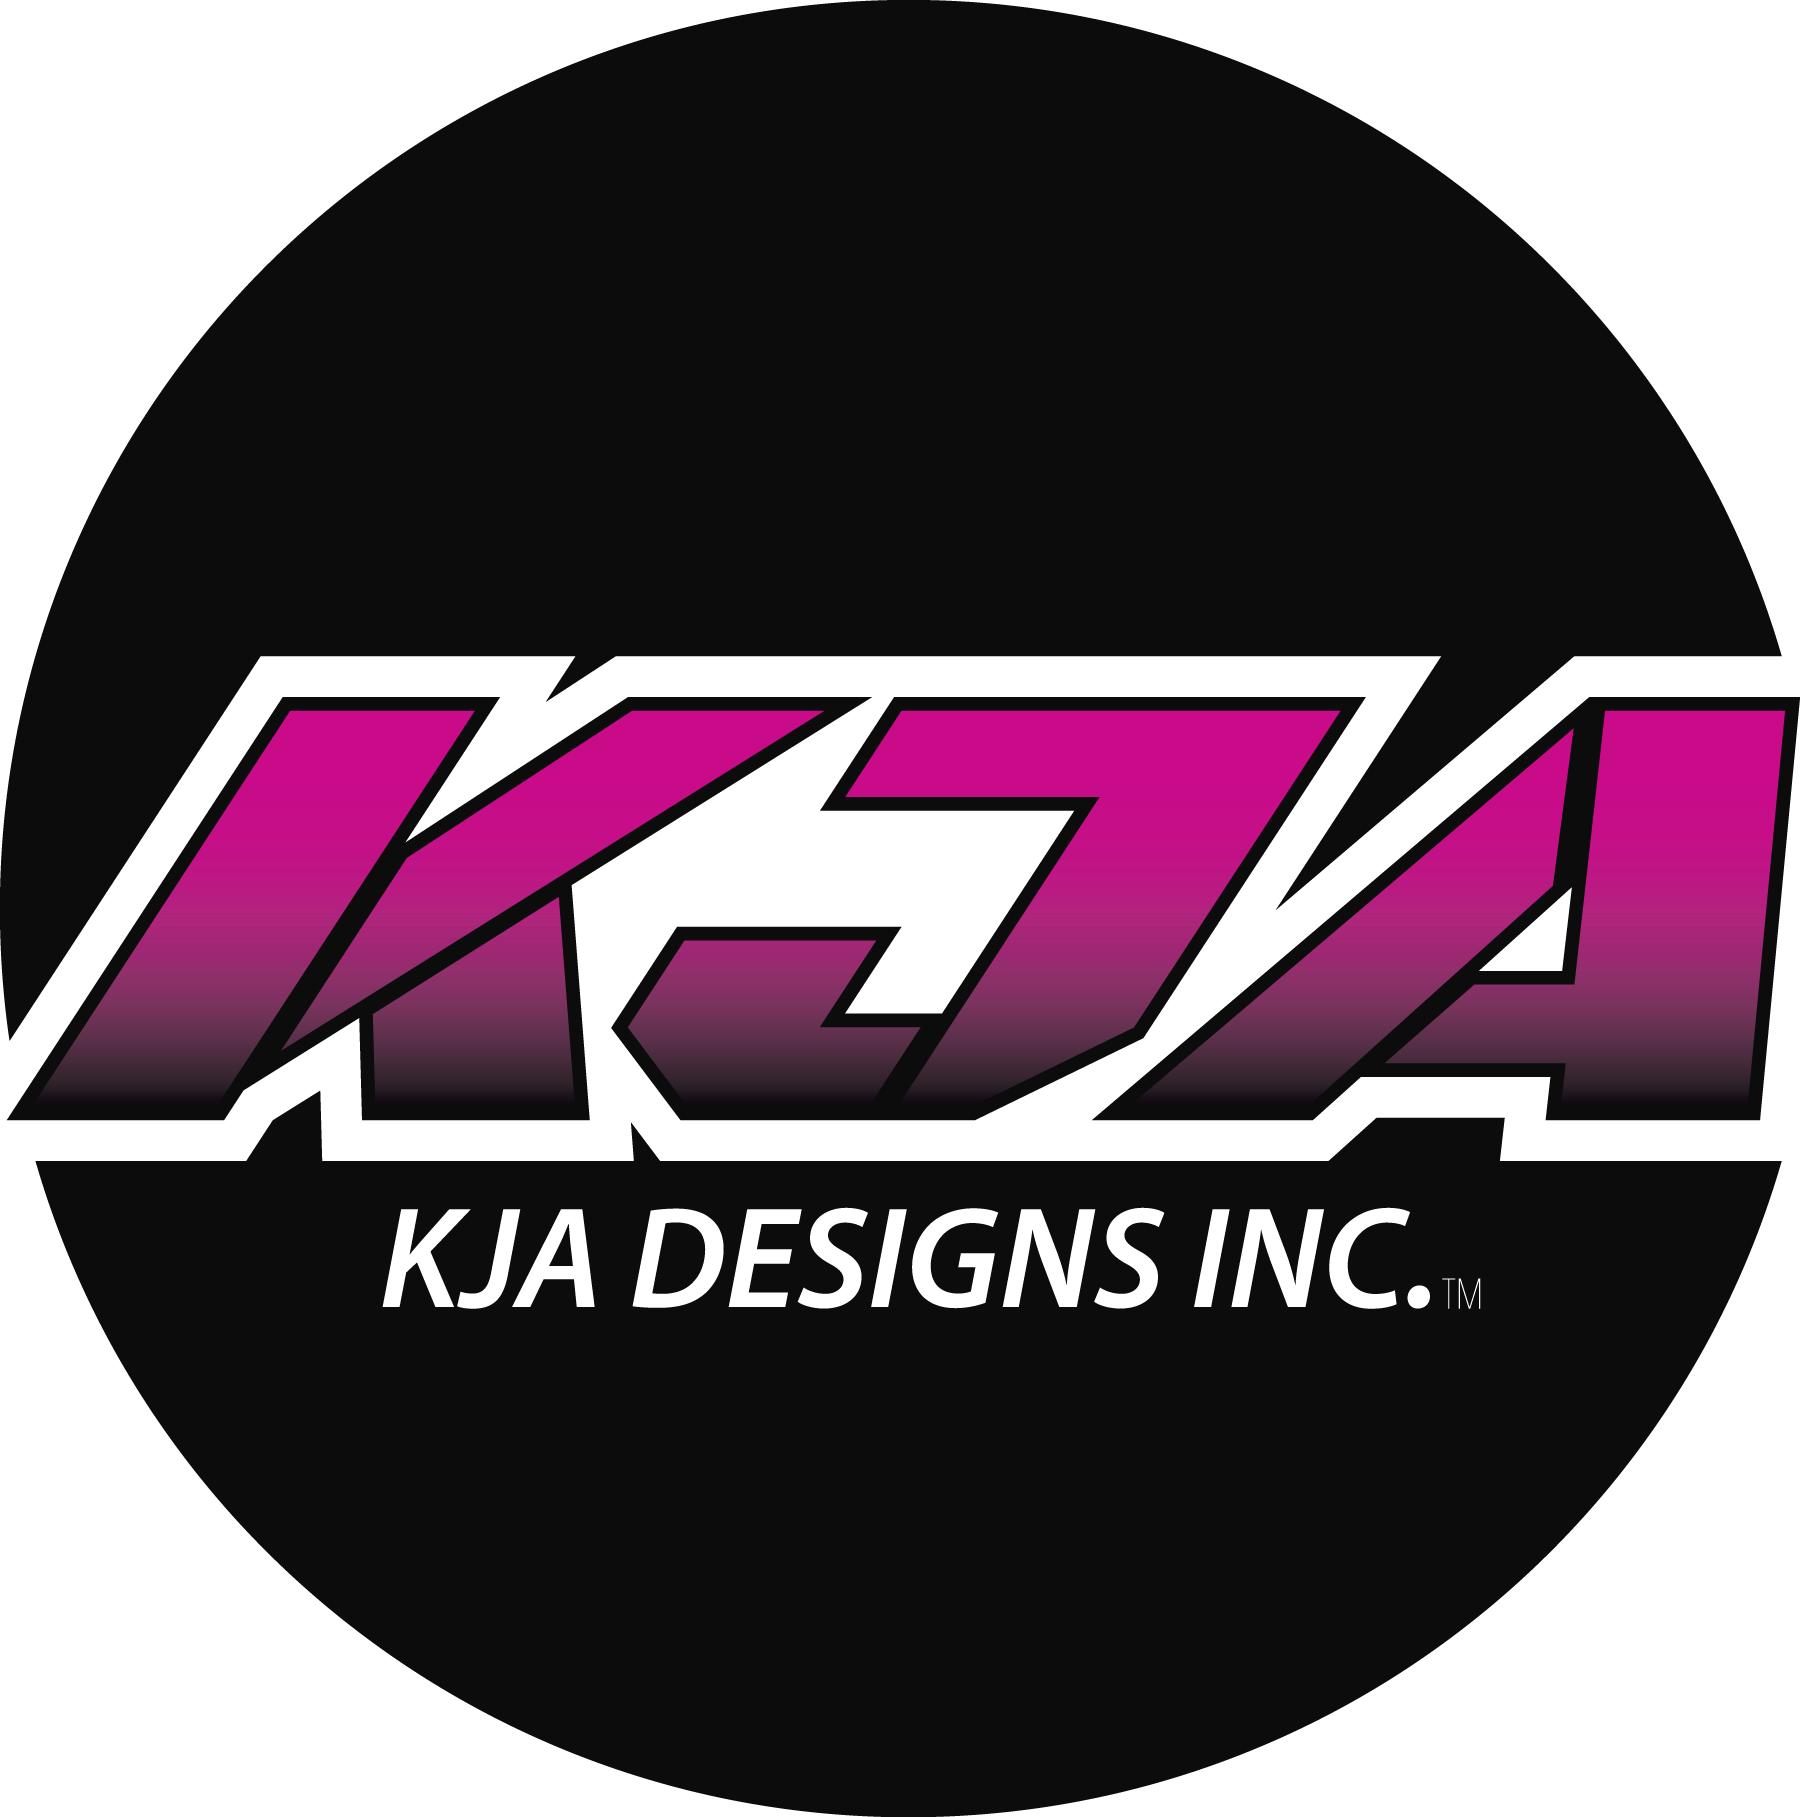 KJA Designs Inc.™ 4A on site